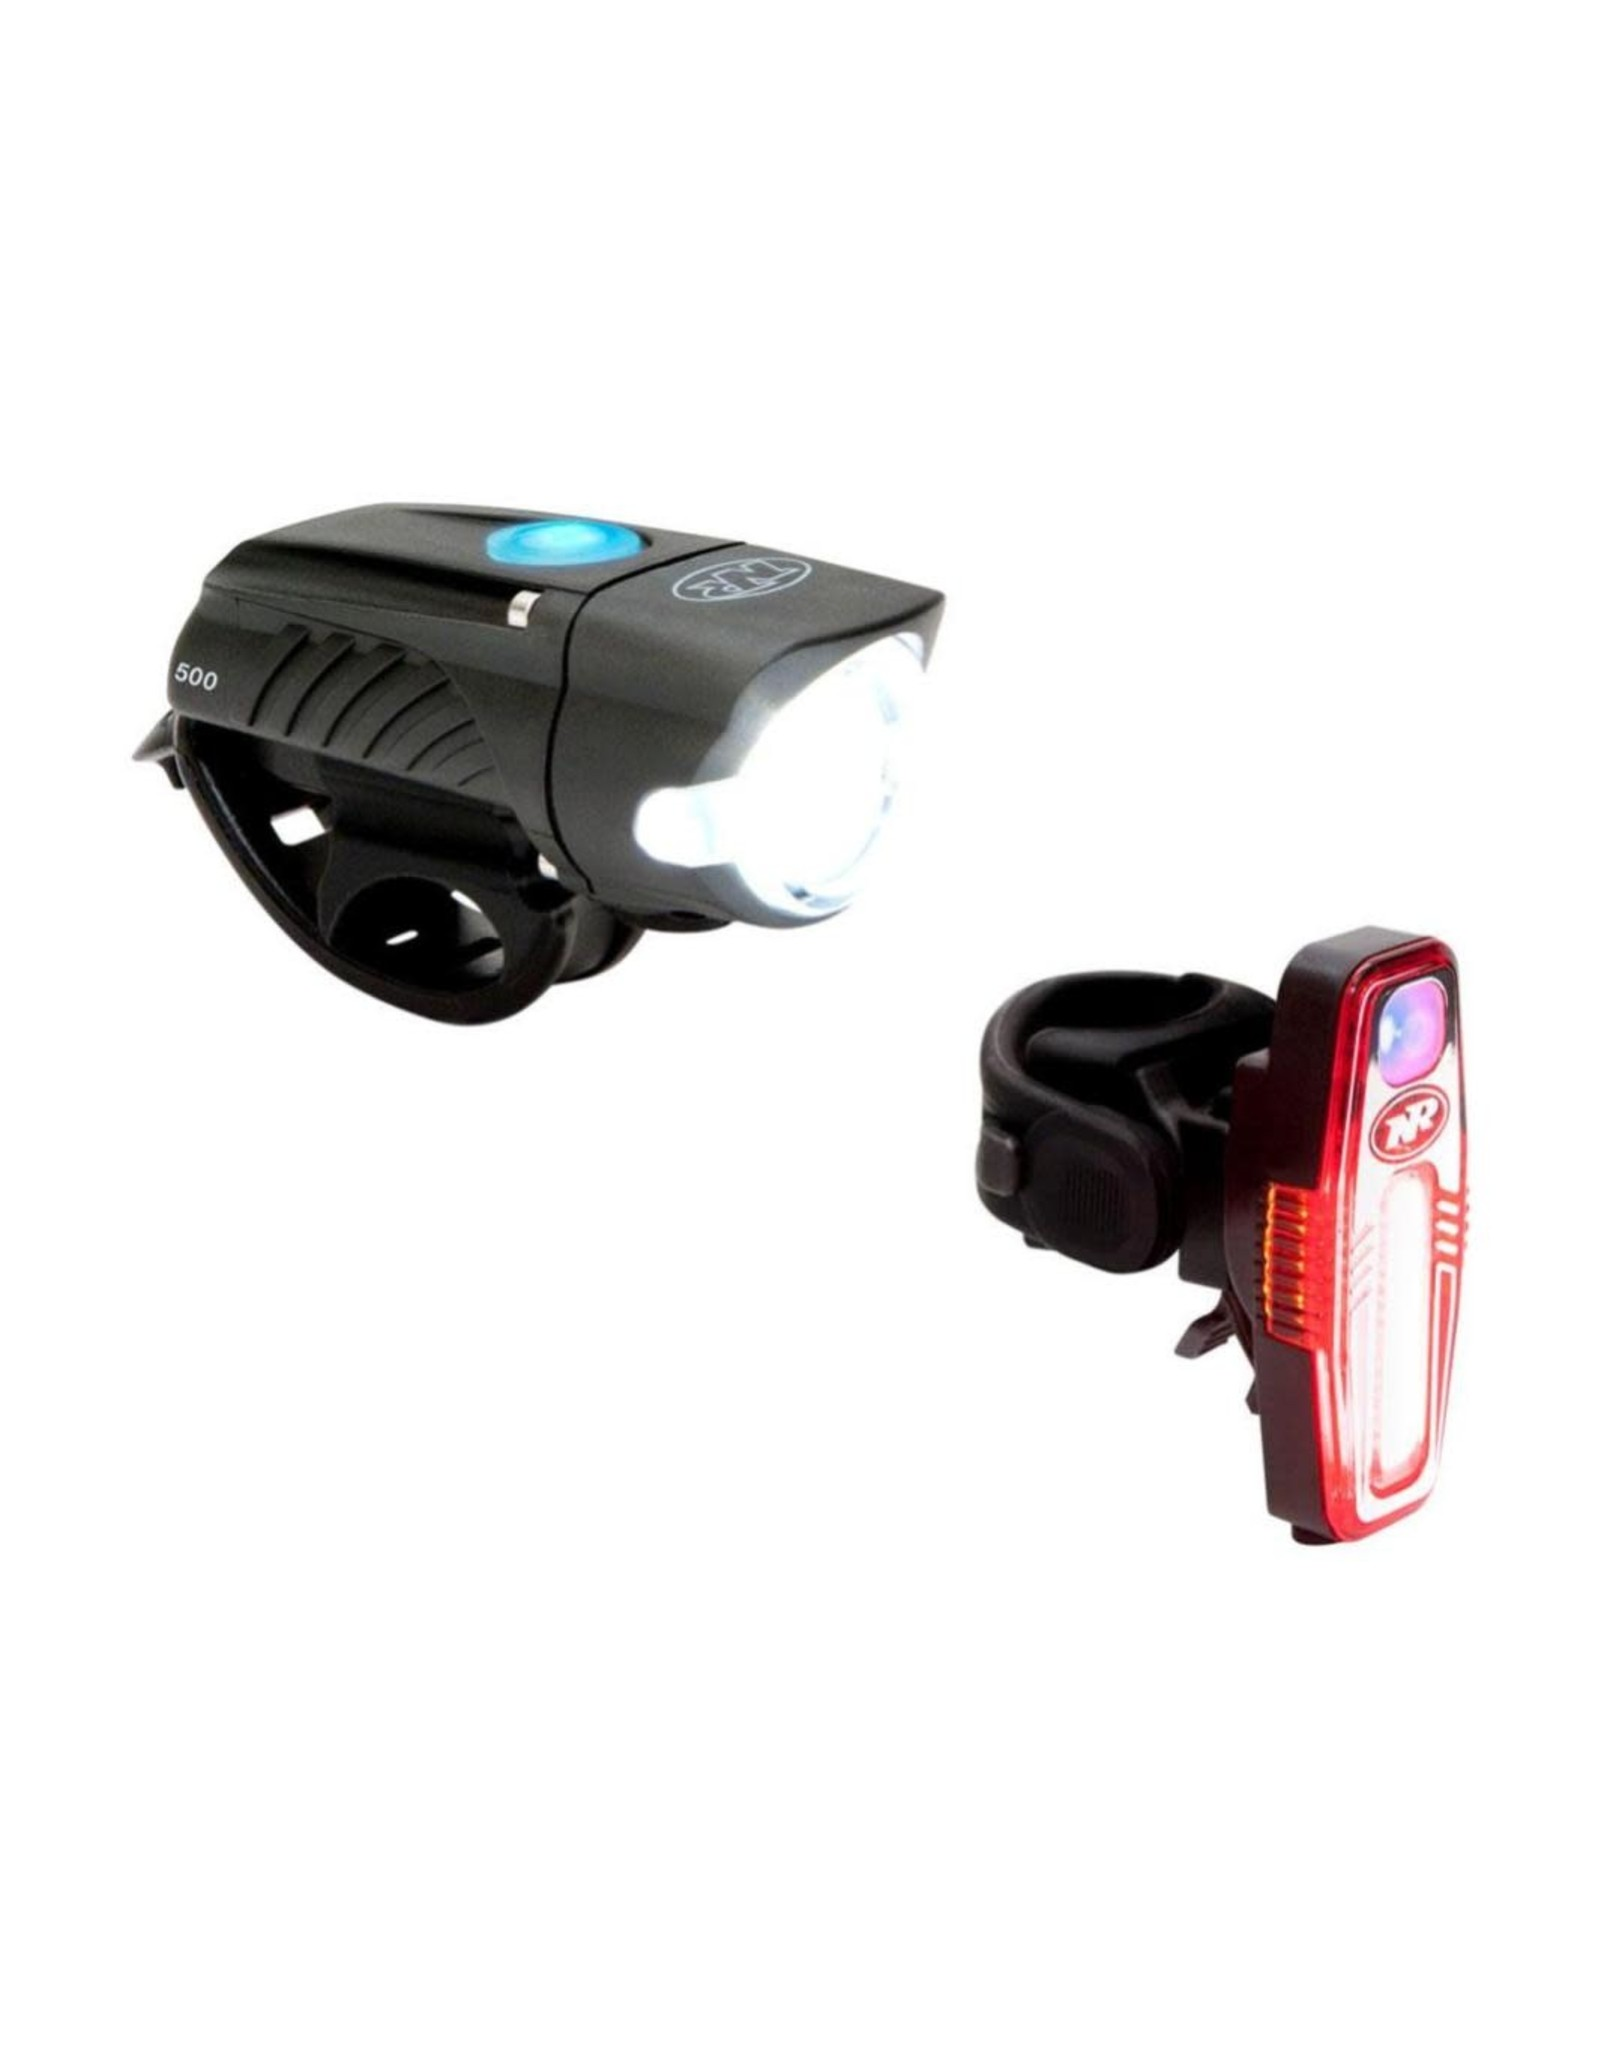 NiteRider Lumina 650 and Sabre 110 Headlight and Taillight Set